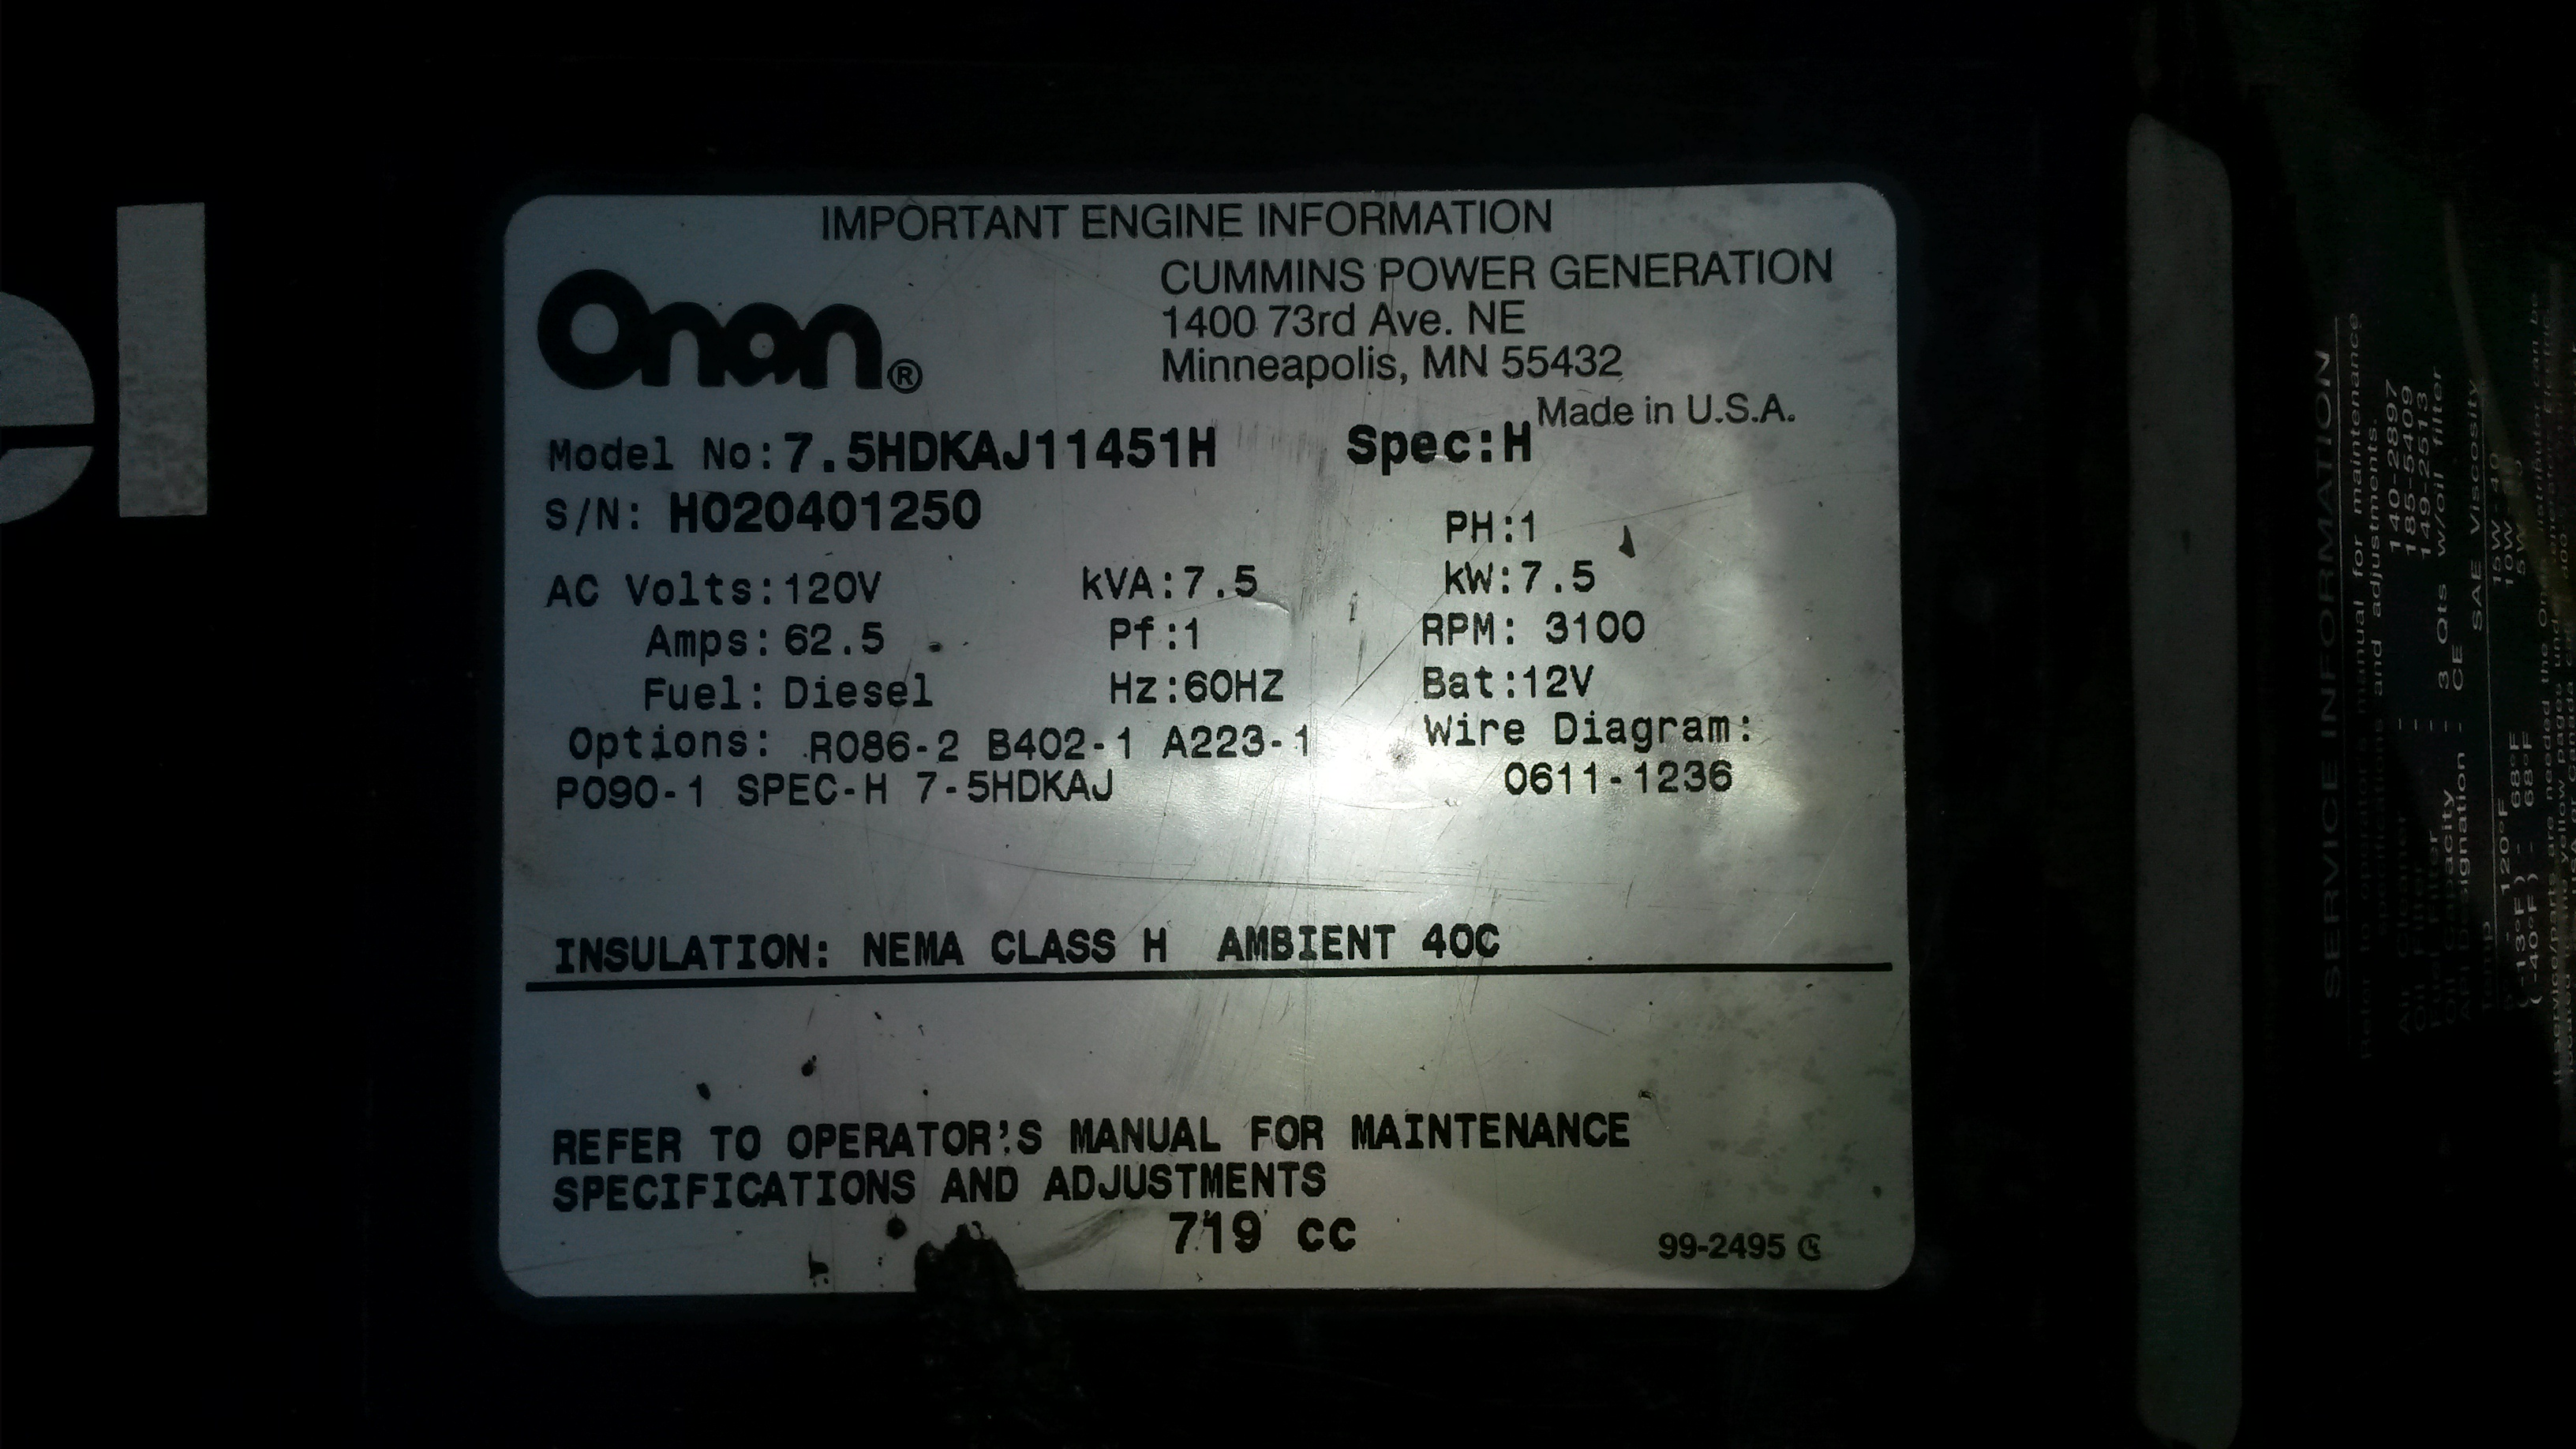 onan quiet diesel 7500 service manual